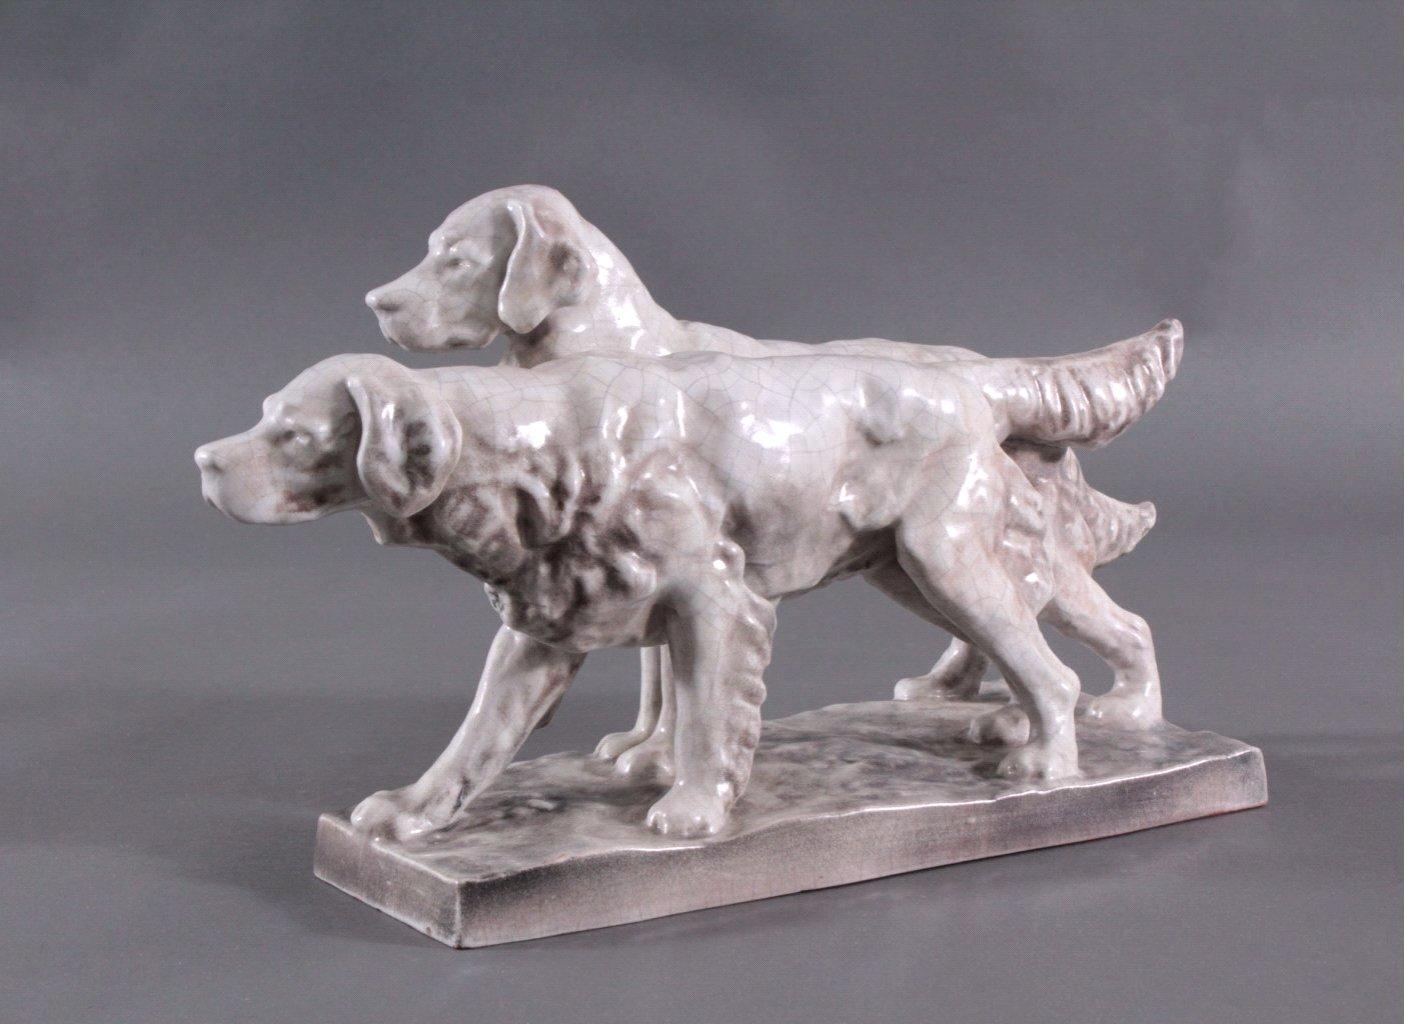 Figurengruppe Hunde, Karlsruher Majolika 1. Hälfte 20. Jh.